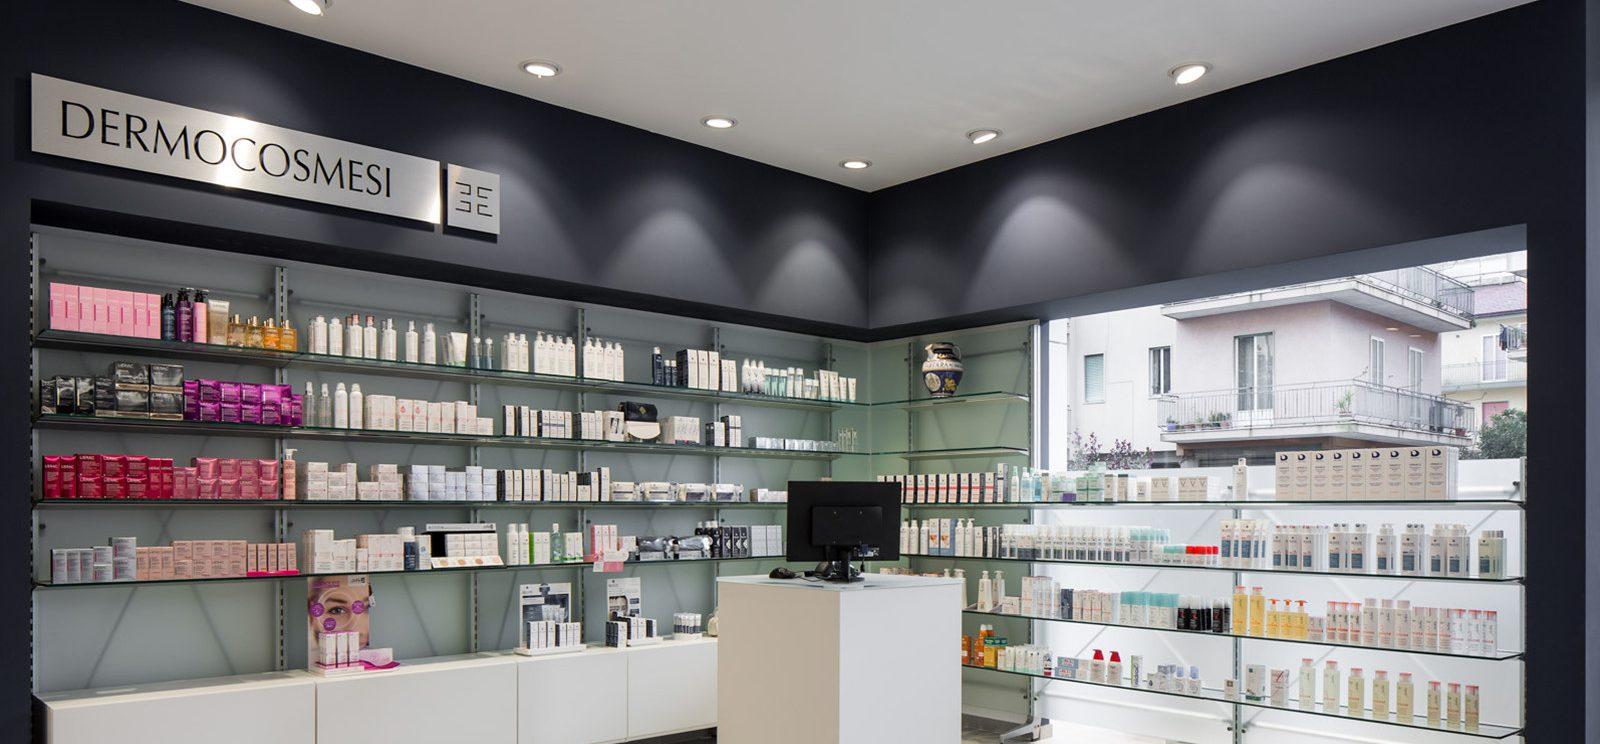 Farmacia Croce Verde dott. Parisi - dermocosmesi